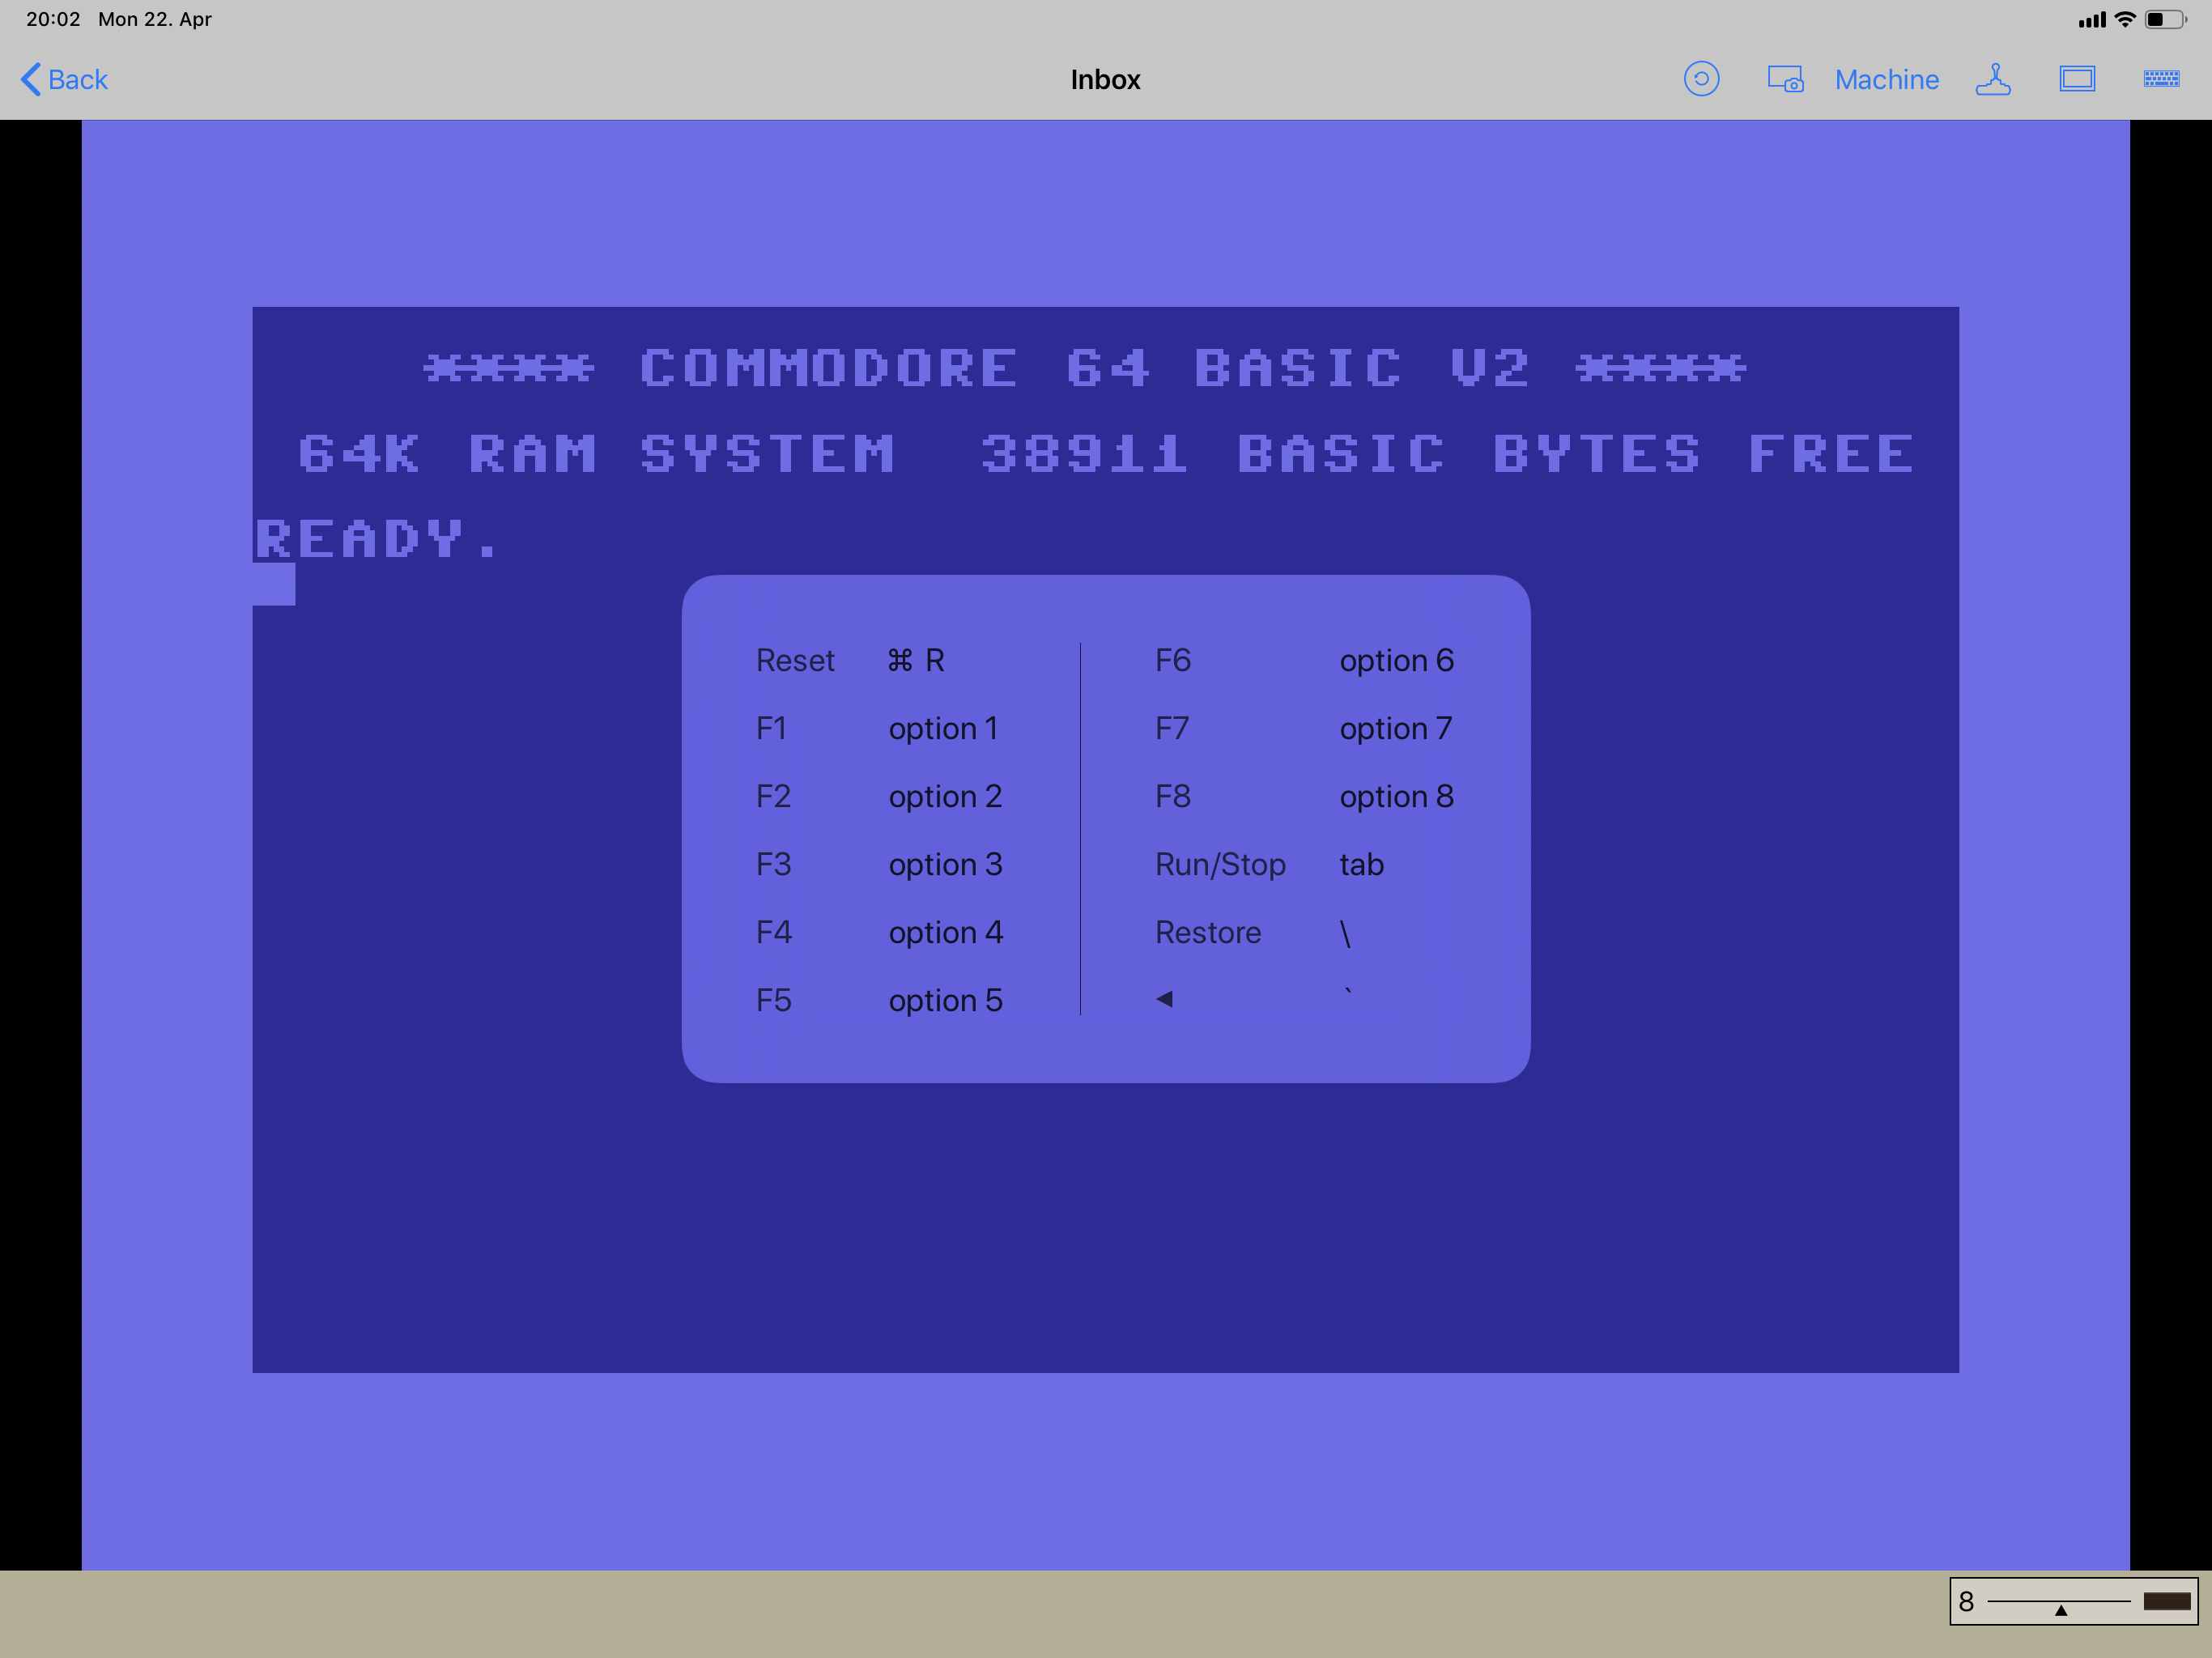 New C64 Emulator for the iPad